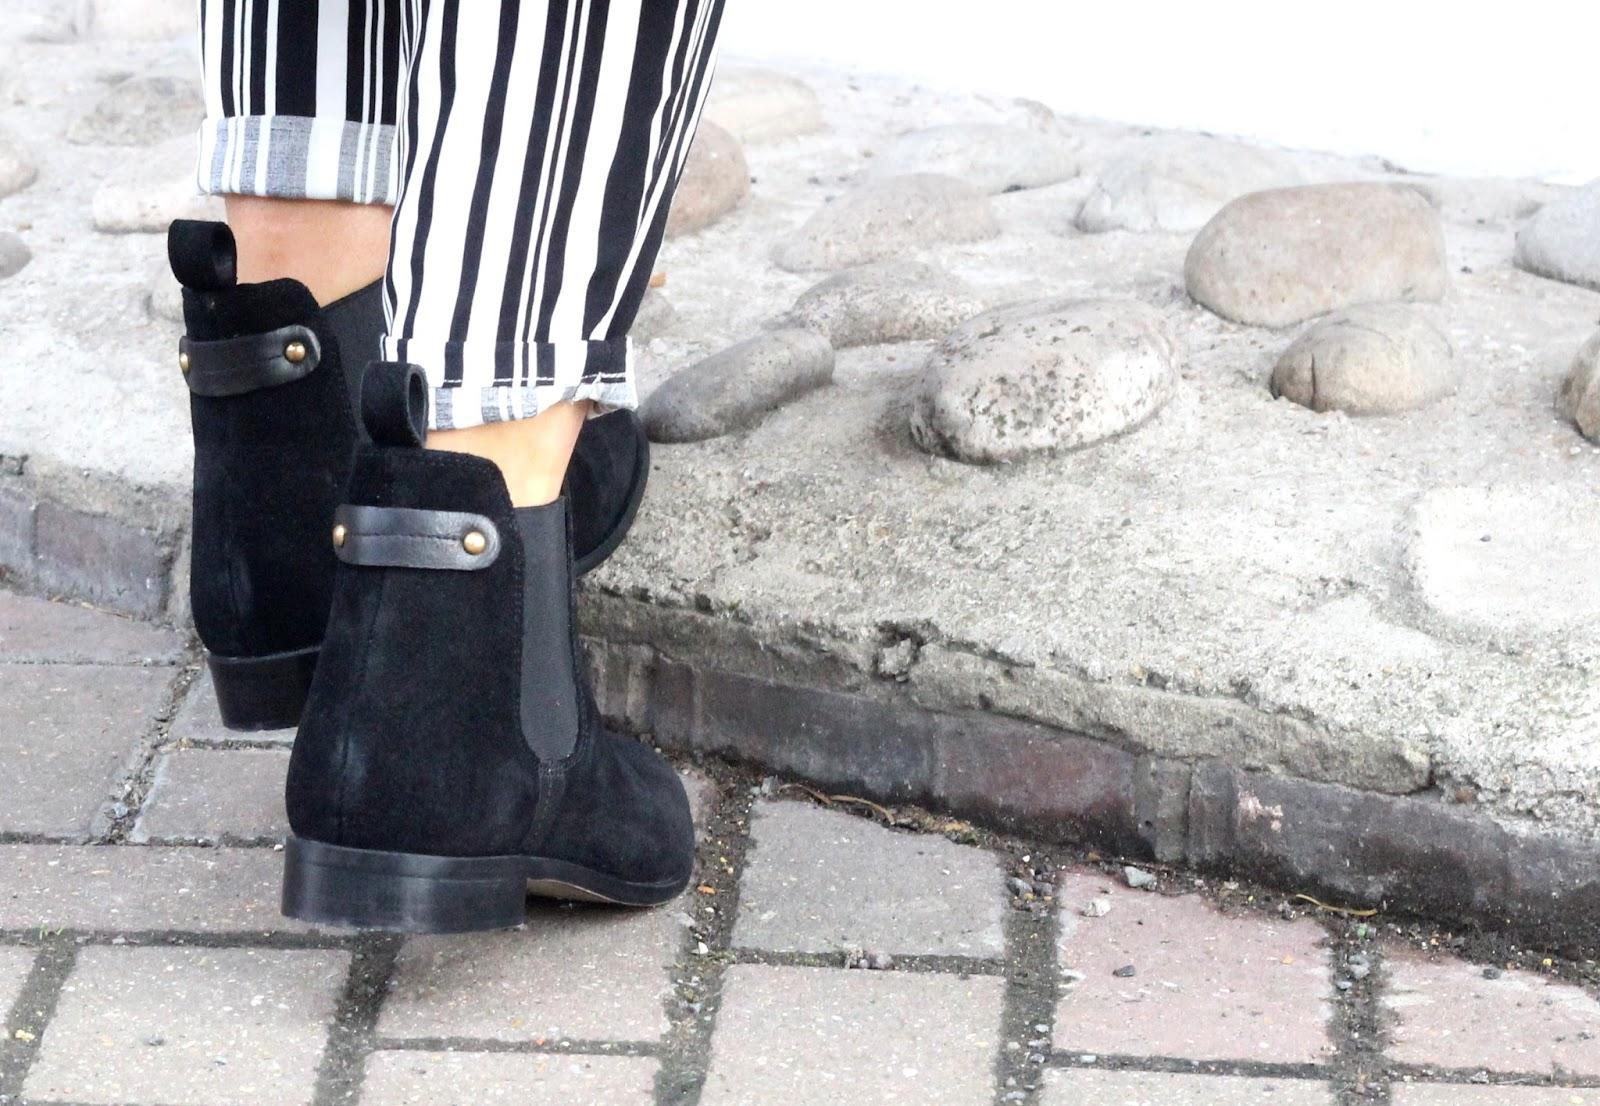 copper-garden-blog-shoeaholics-brand-collaboration-kurt-geiger-shoes